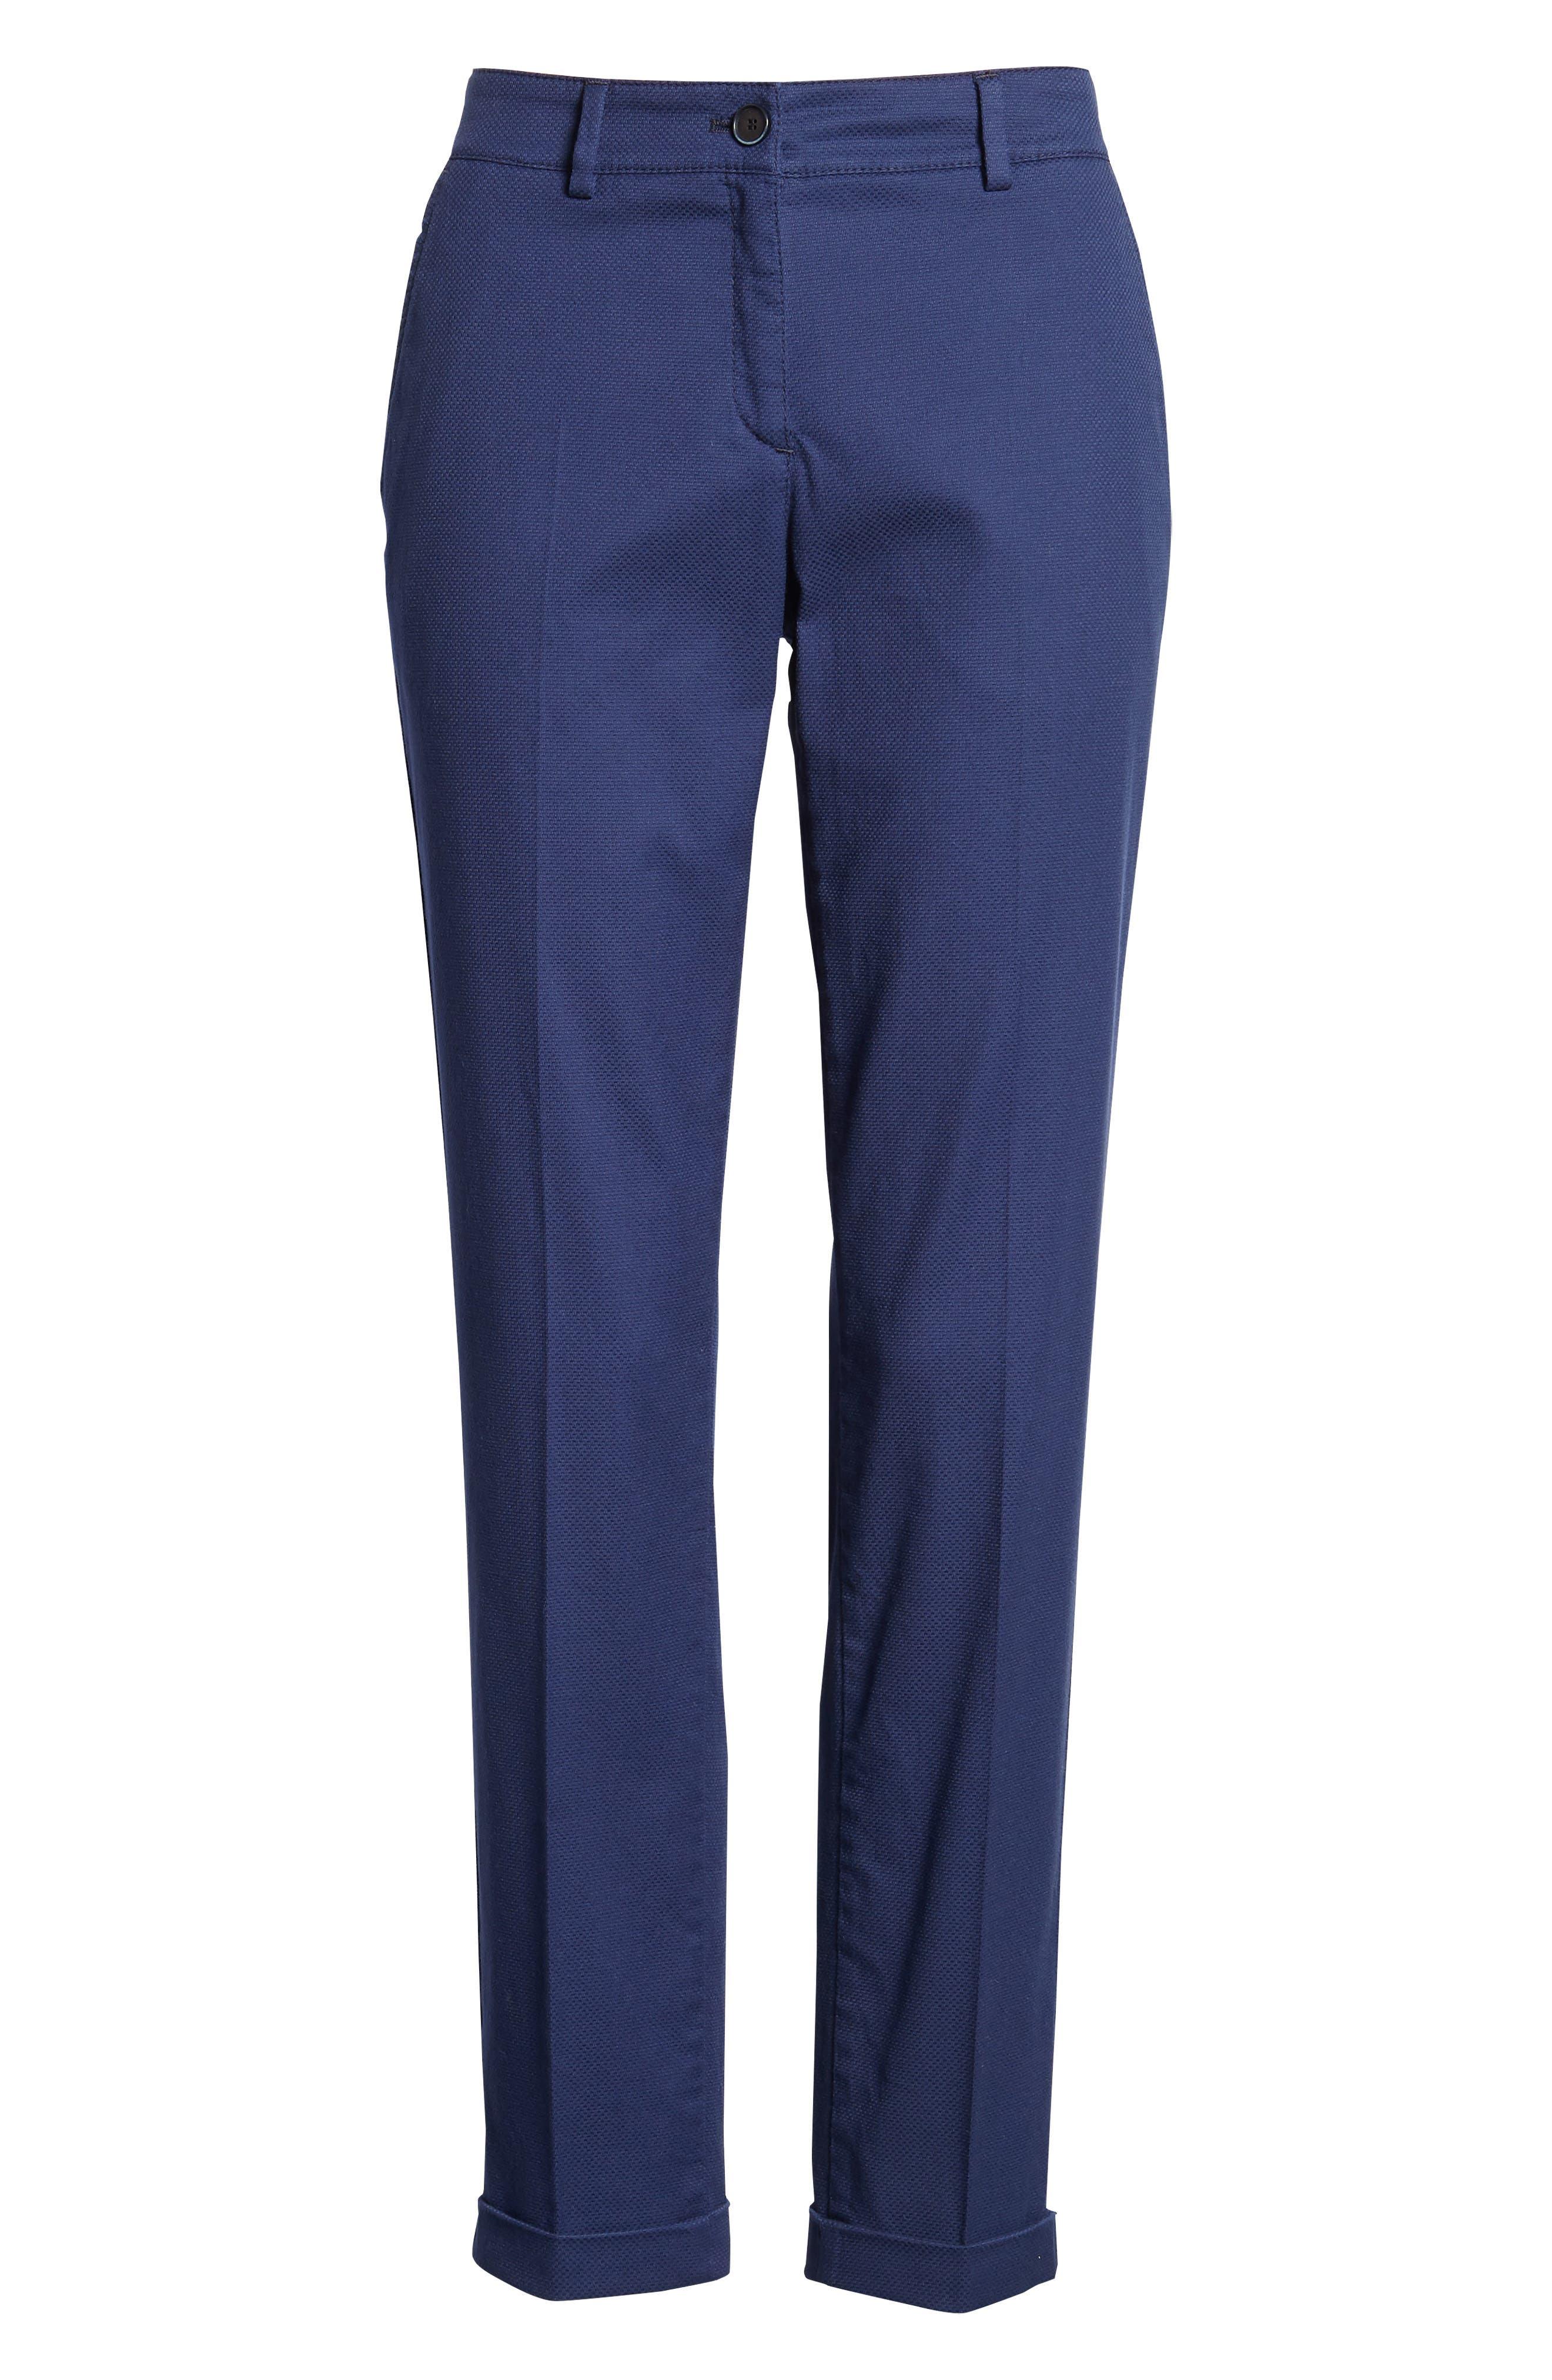 Maron Cuffed Straight Leg Pants,                             Alternate thumbnail 7, color,